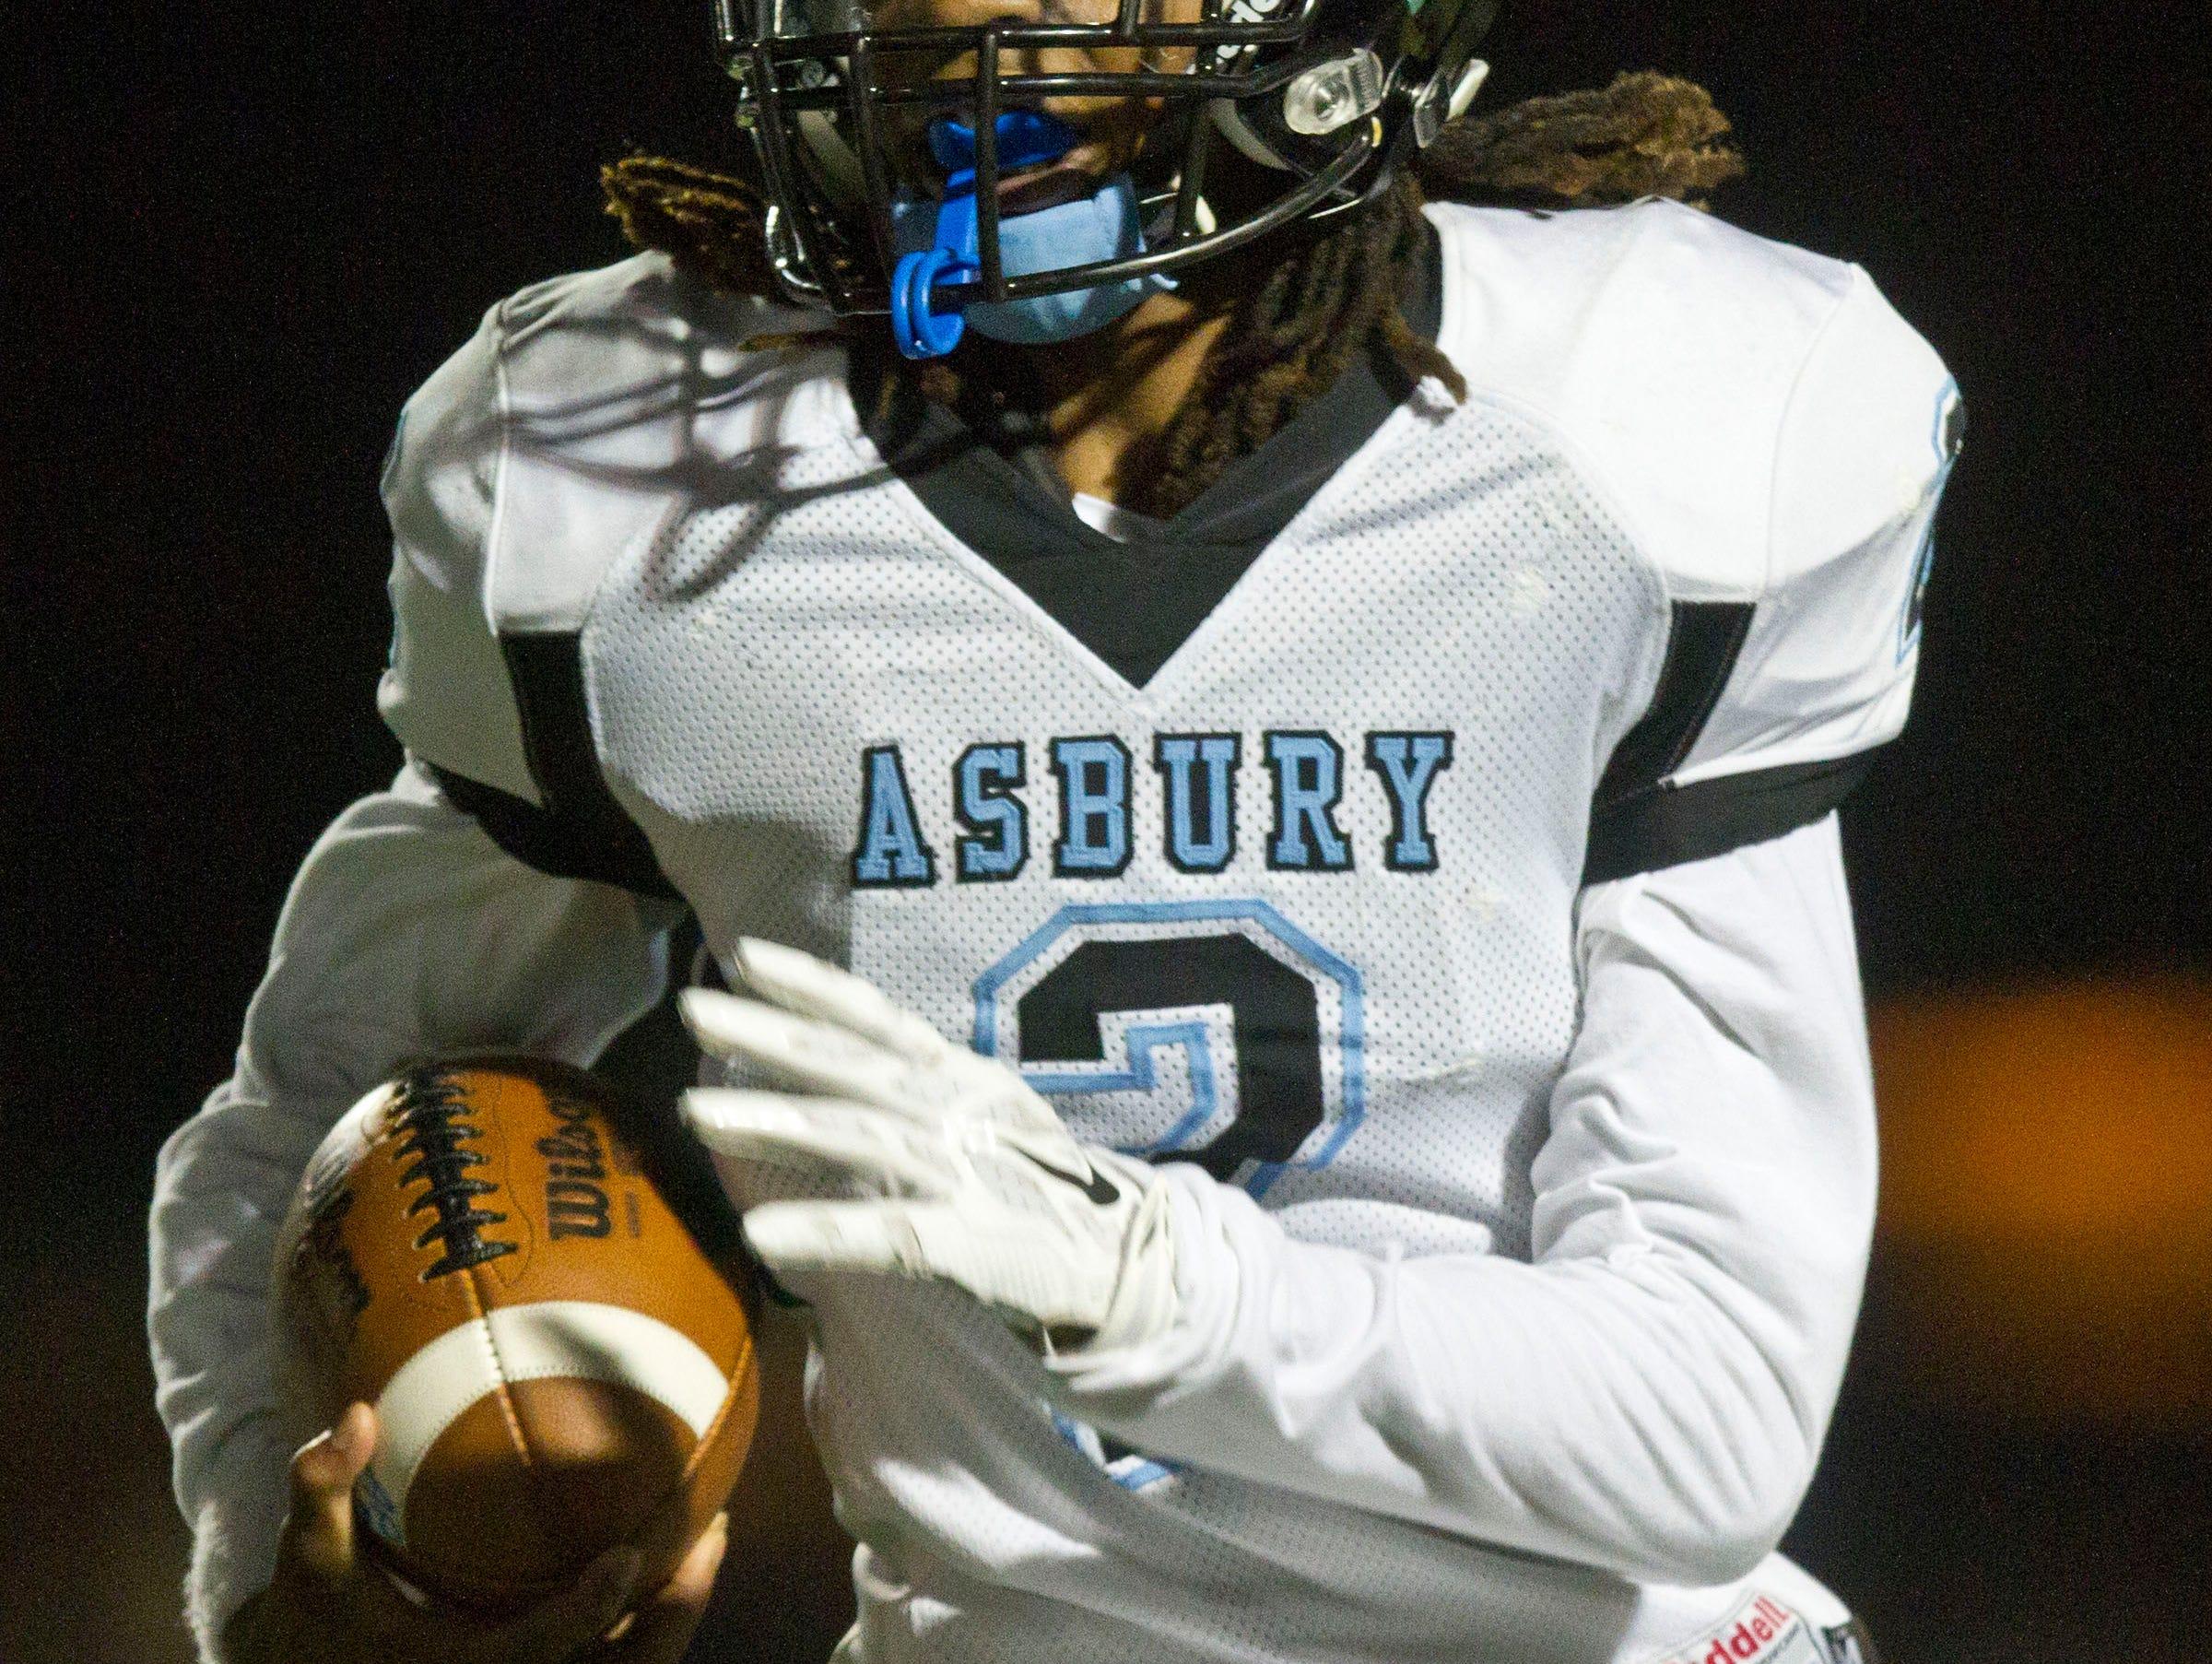 Asbury Park's Tyreek Mccain gains yards on the ground. Asbury Park vs Shore Regional football. Asbury Park, NJ Freiday, November 6, 2015 @dhoodhood